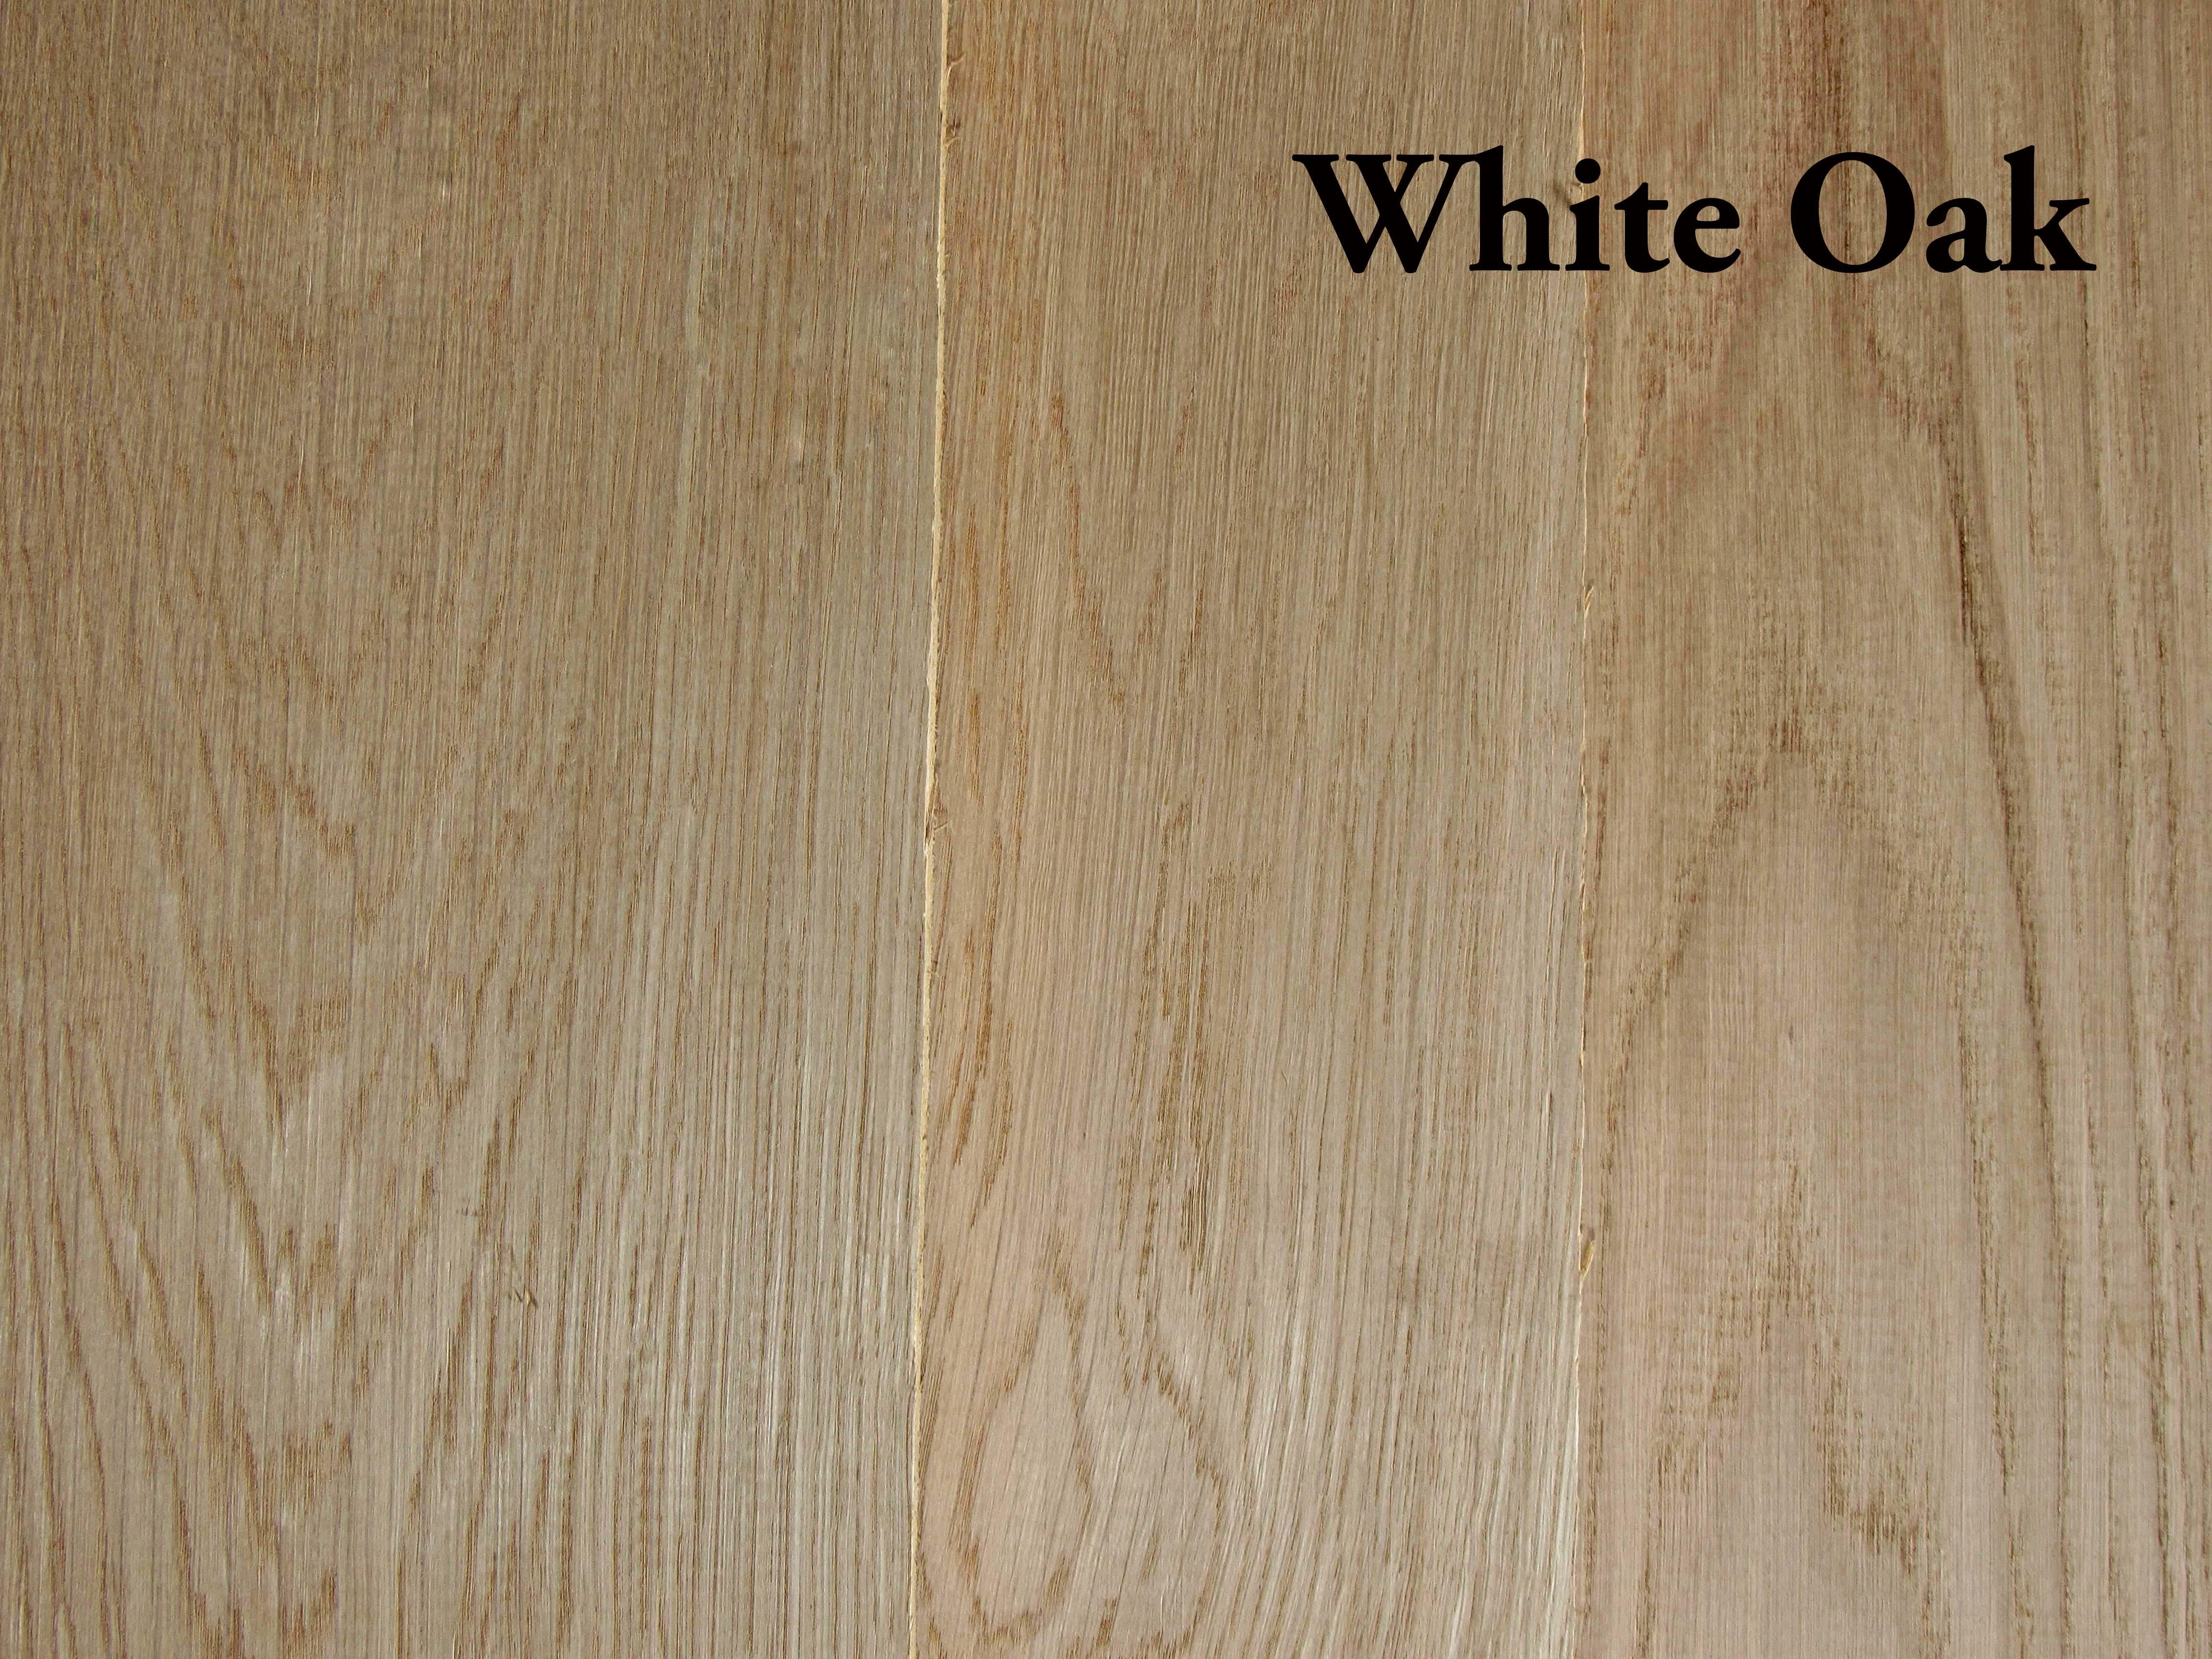 Oak White Hardwood Rough Capitol City Lumber